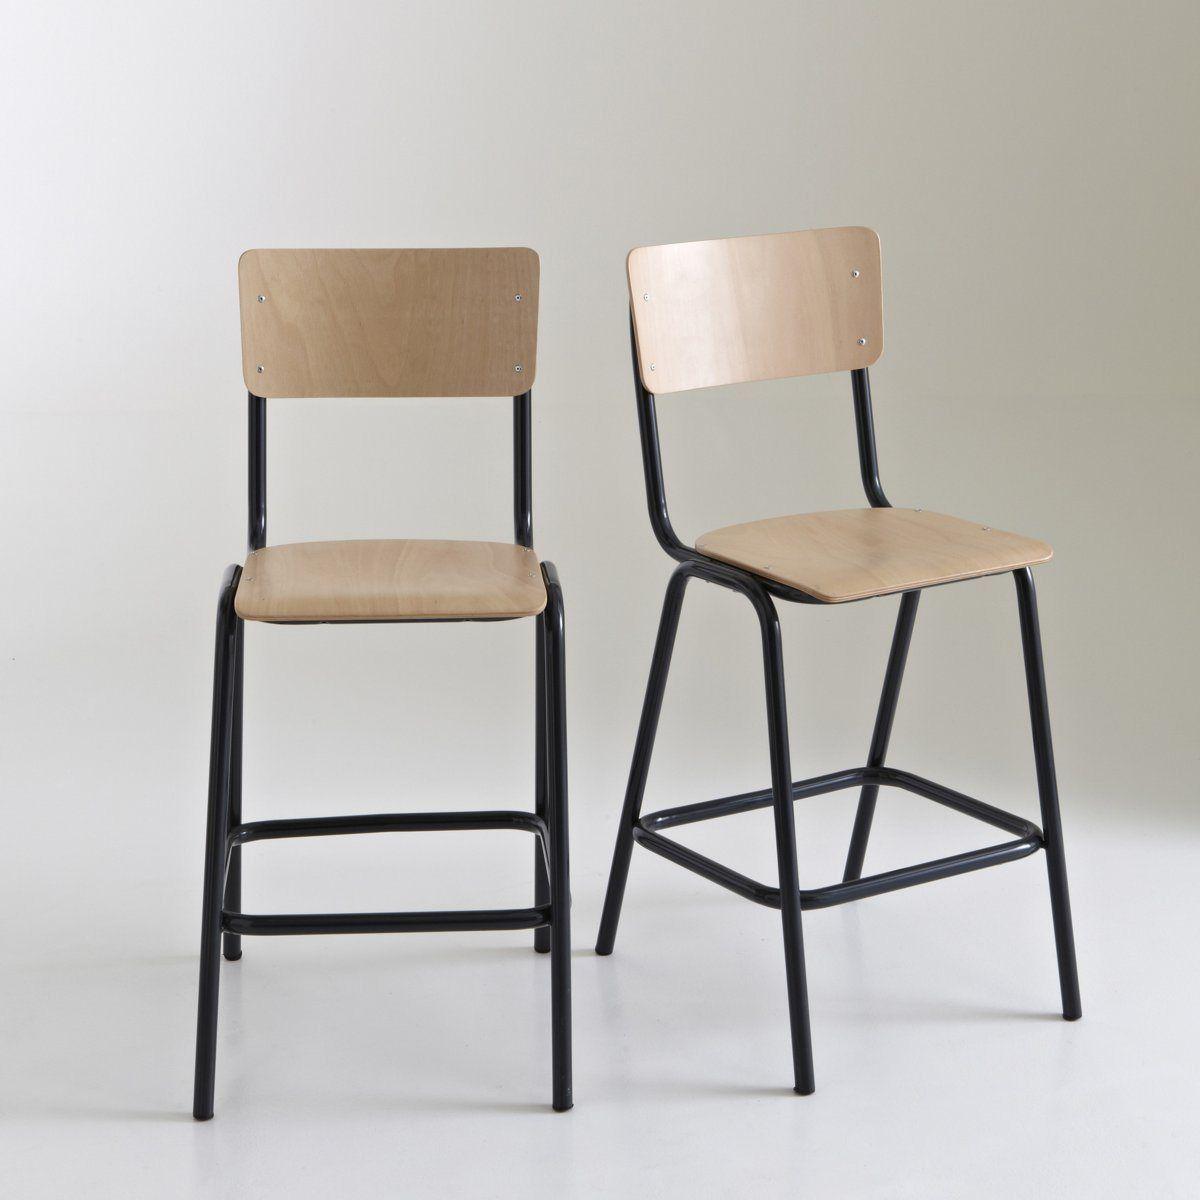 La Redoute Chaise Haute Chaise Chaise Cuisine